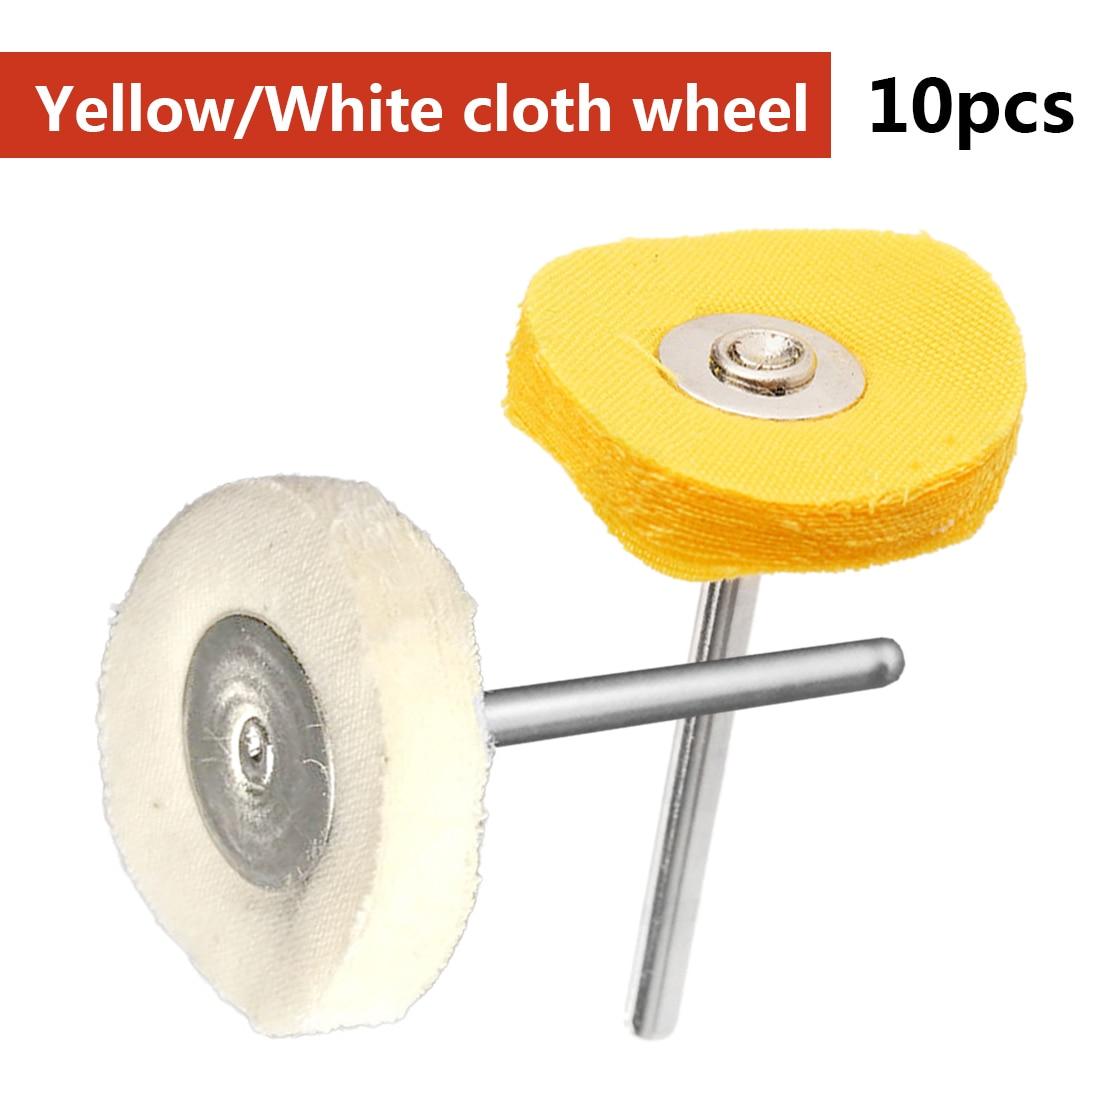 Brush Set 10pcs/set Polishing Wheel Buffing Pad for Jewelry Jade Hardware Dremel Accessories for Power Rotary Tools